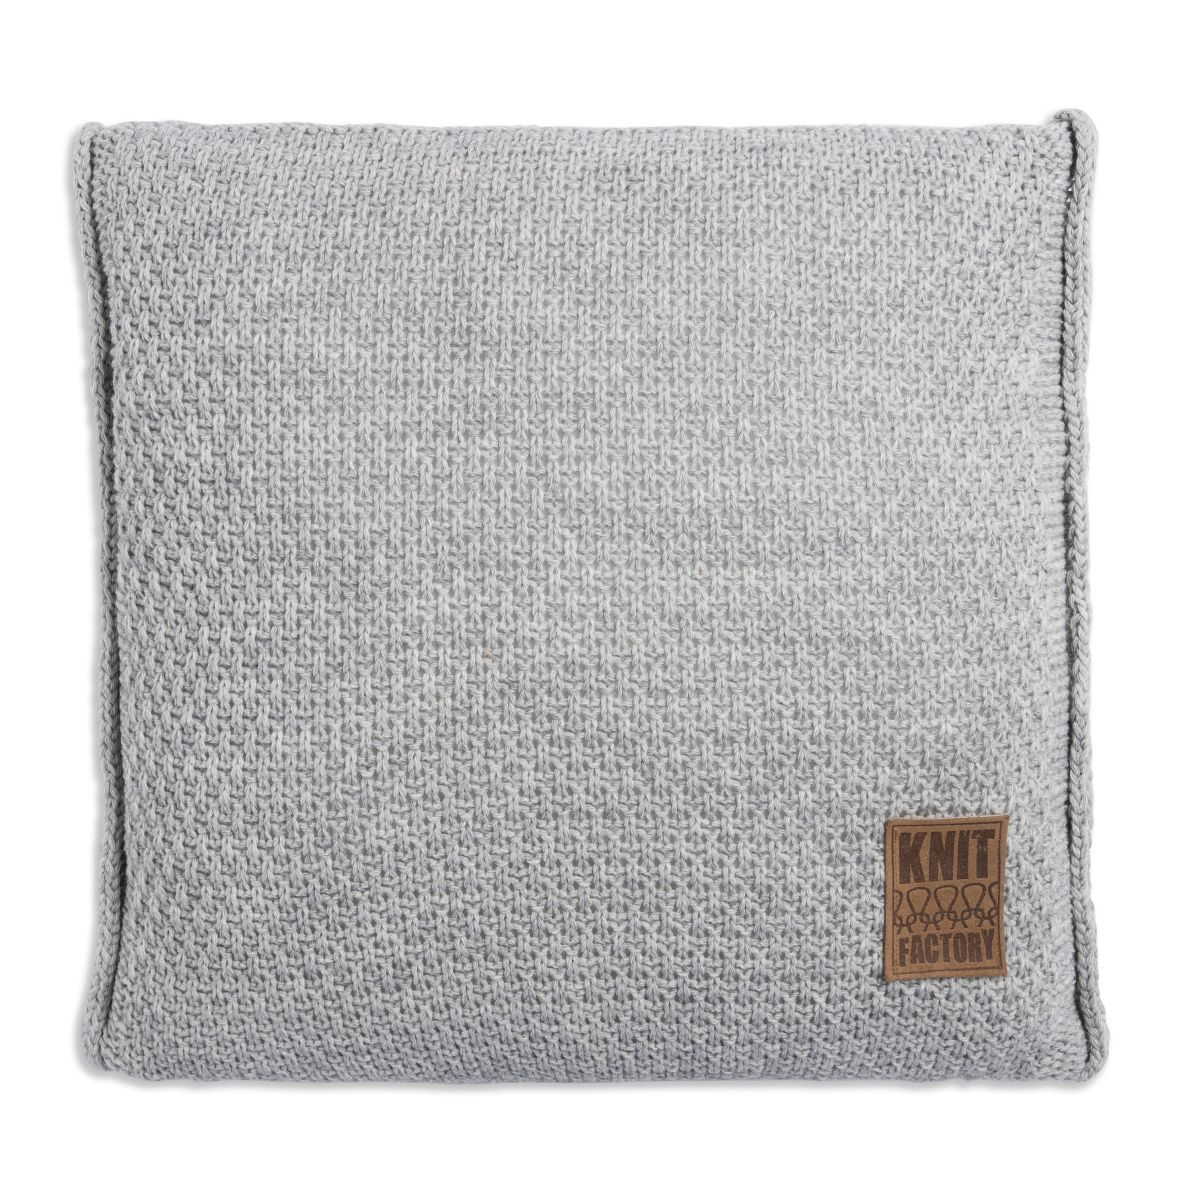 jesse cushion light grey 50x50